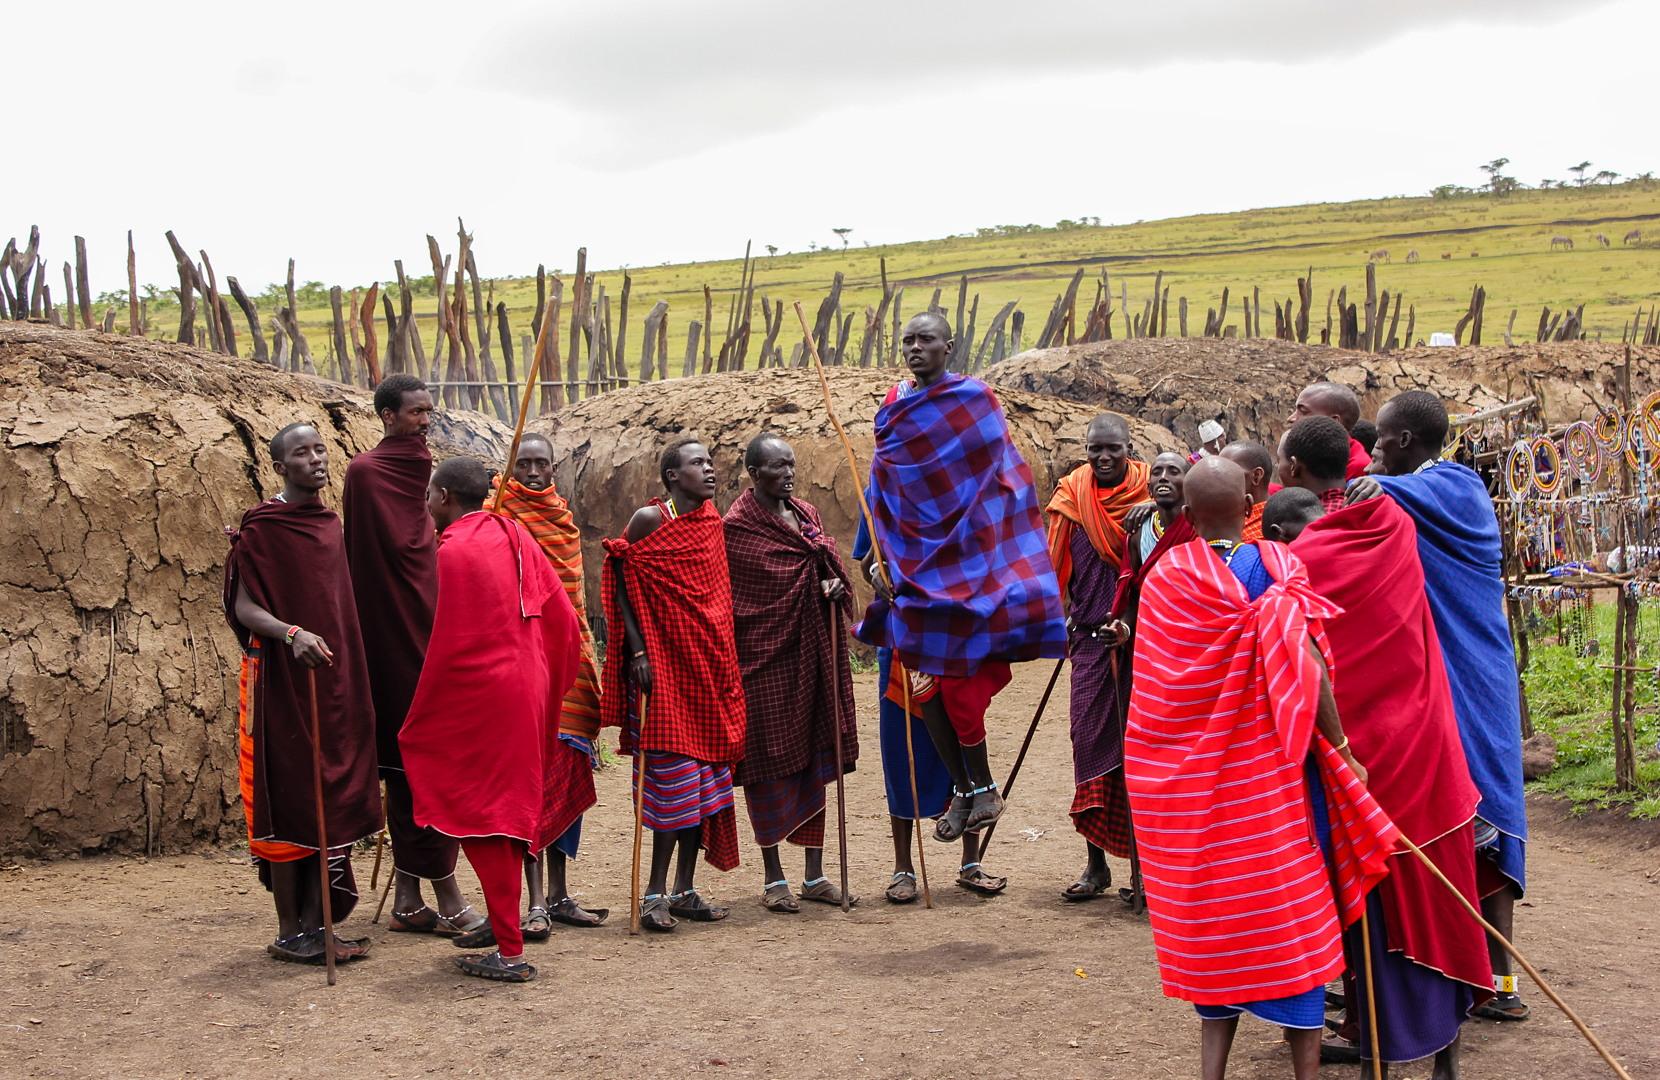 Прыжки масаев, Нгоронгоро